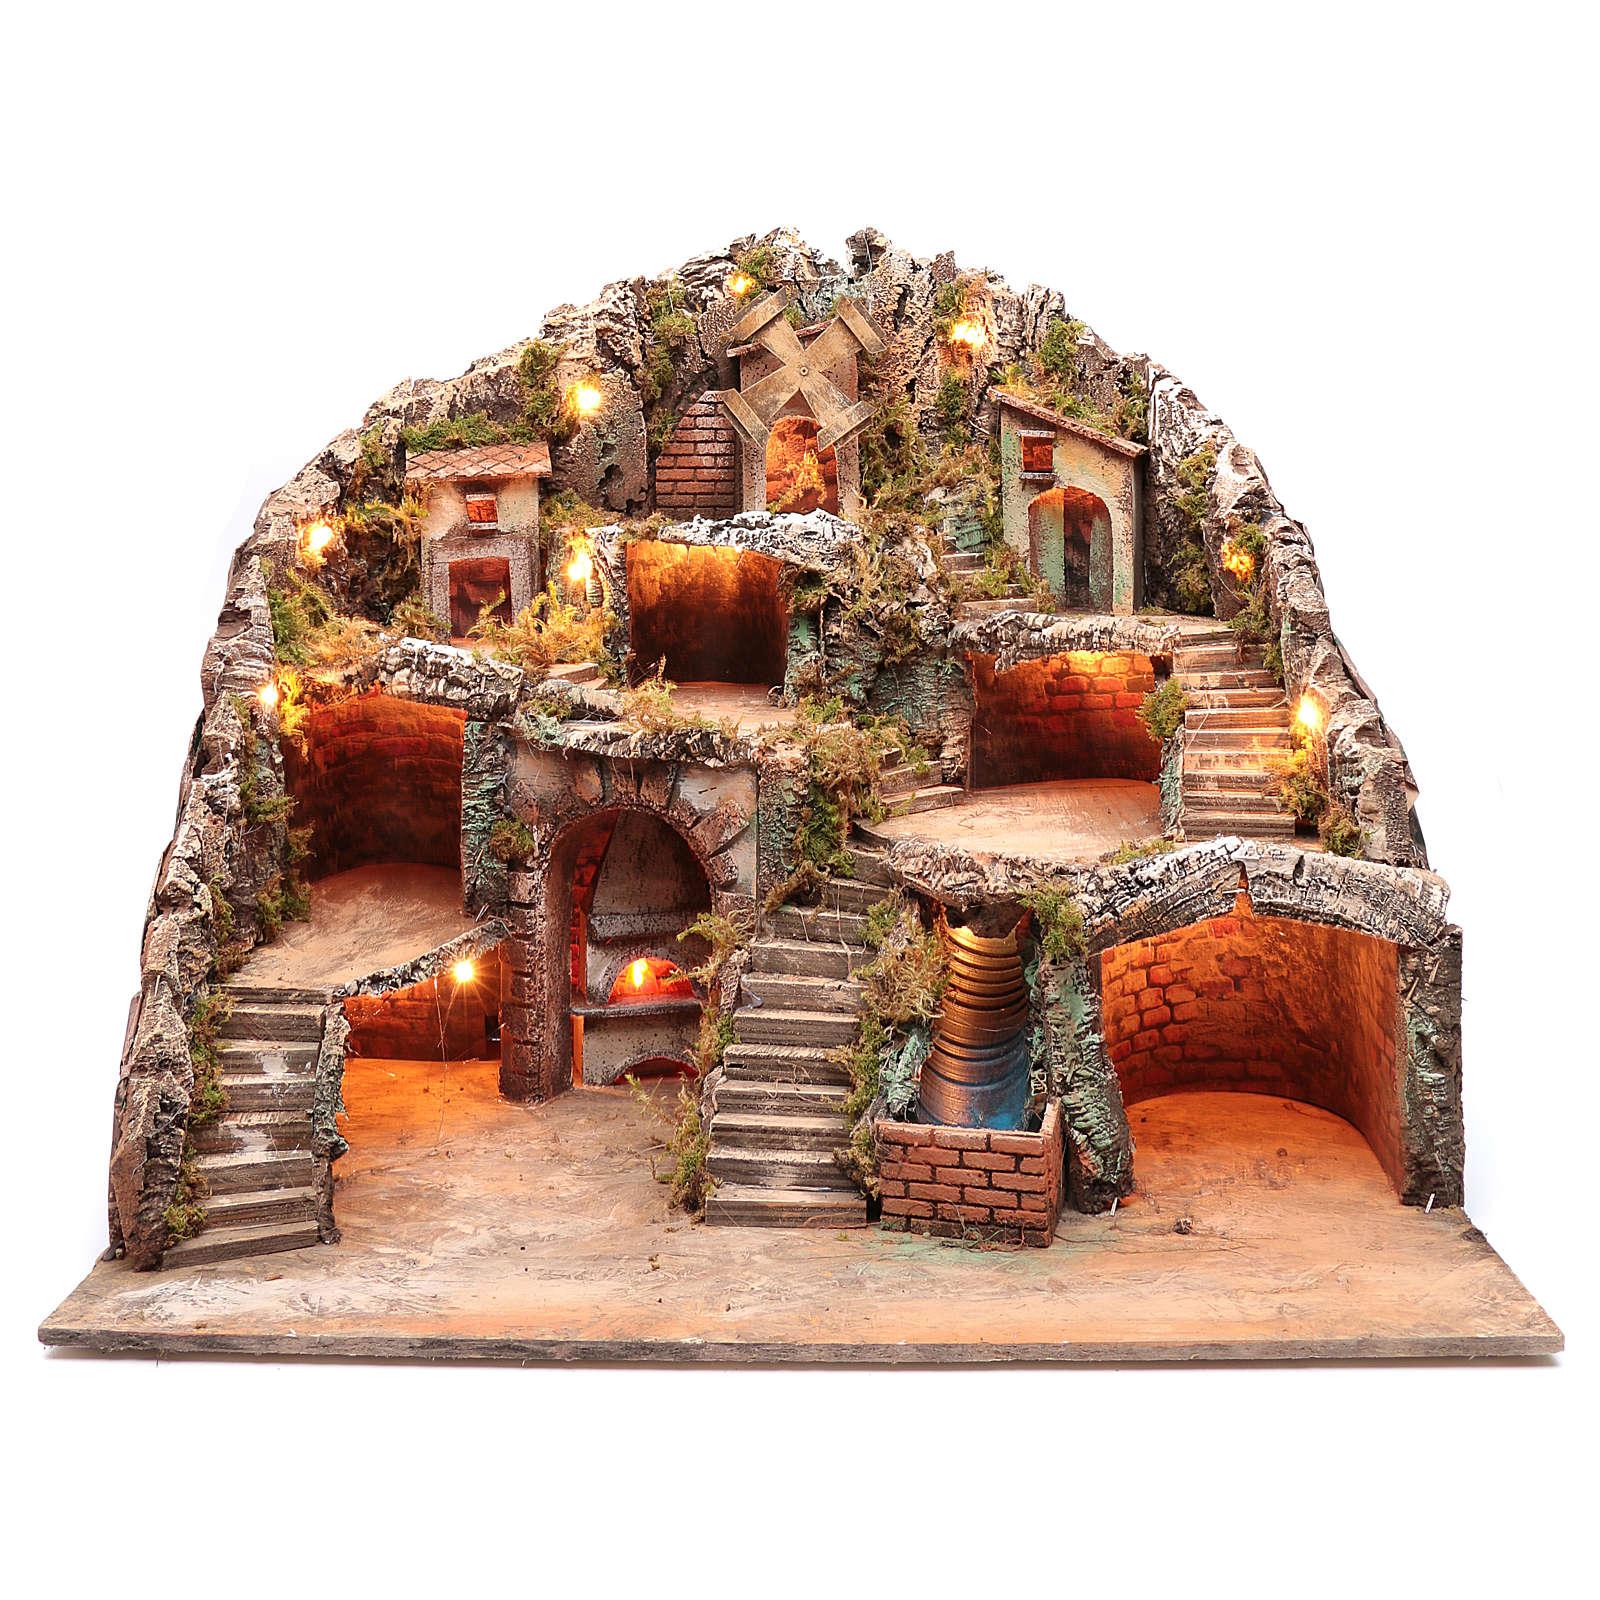 Neapolitan nativity scene setting with hut, stream and mill 55x70x60 cm 4